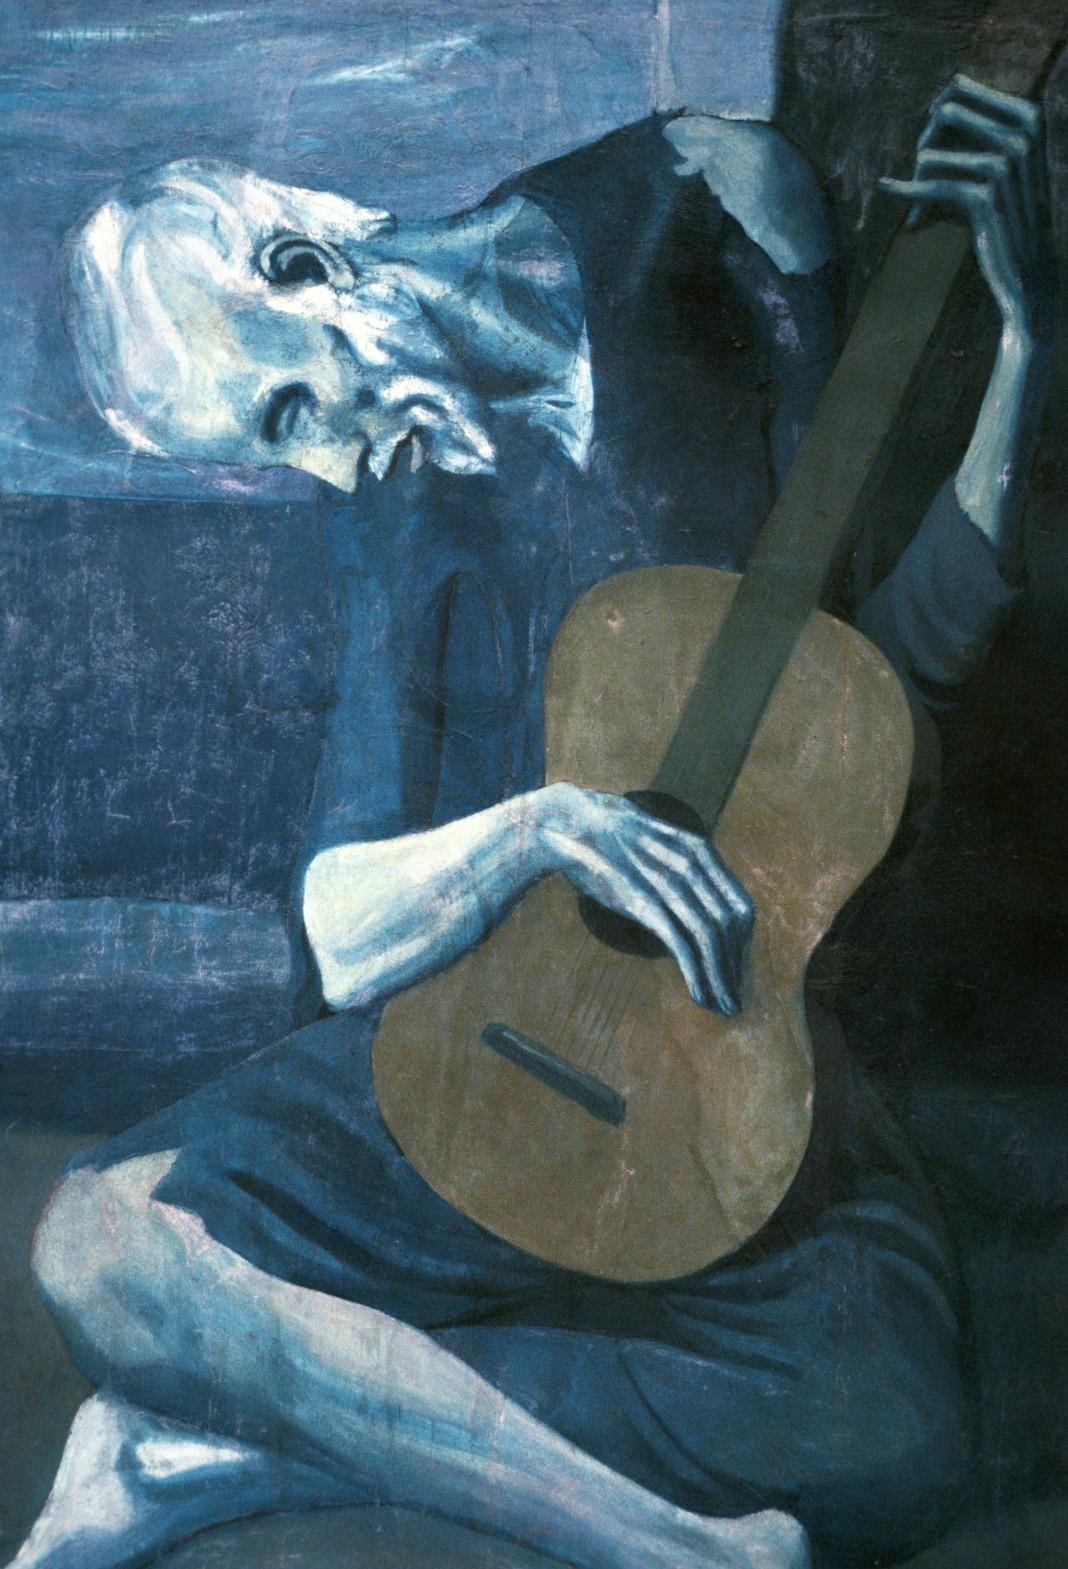 Pablo Picasso The Old Guitarist 1903